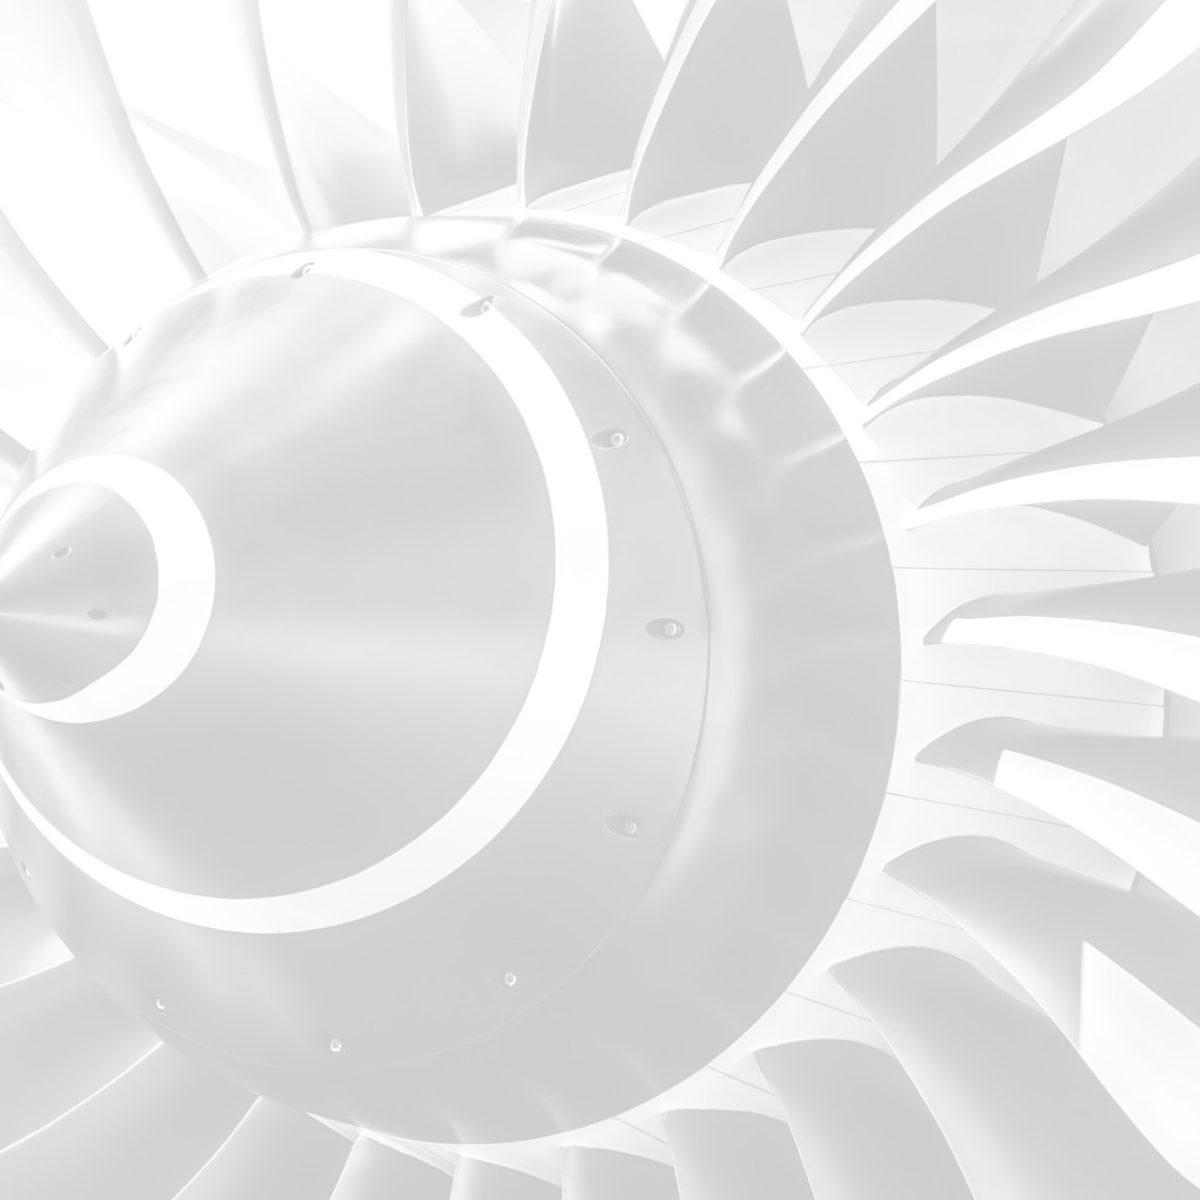 automotive-and-transportation-jet-engine